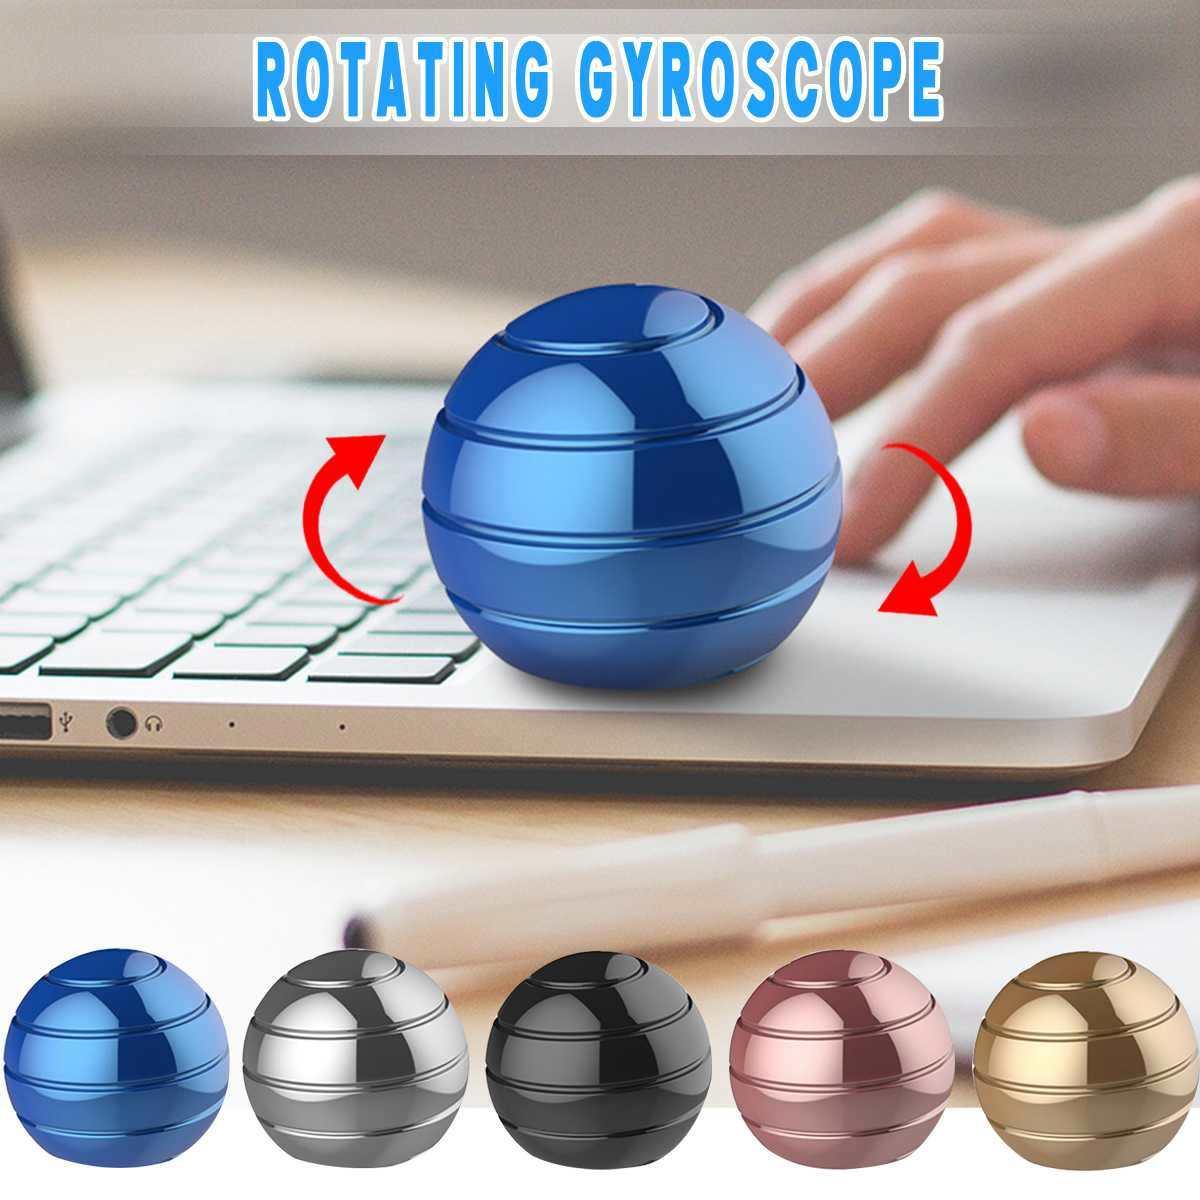 Desktop Decompression Rotating Spherical Gyroscope Metal Spinning Top Office Desk Fidget Finger Toys Office Pressure Relief Gift